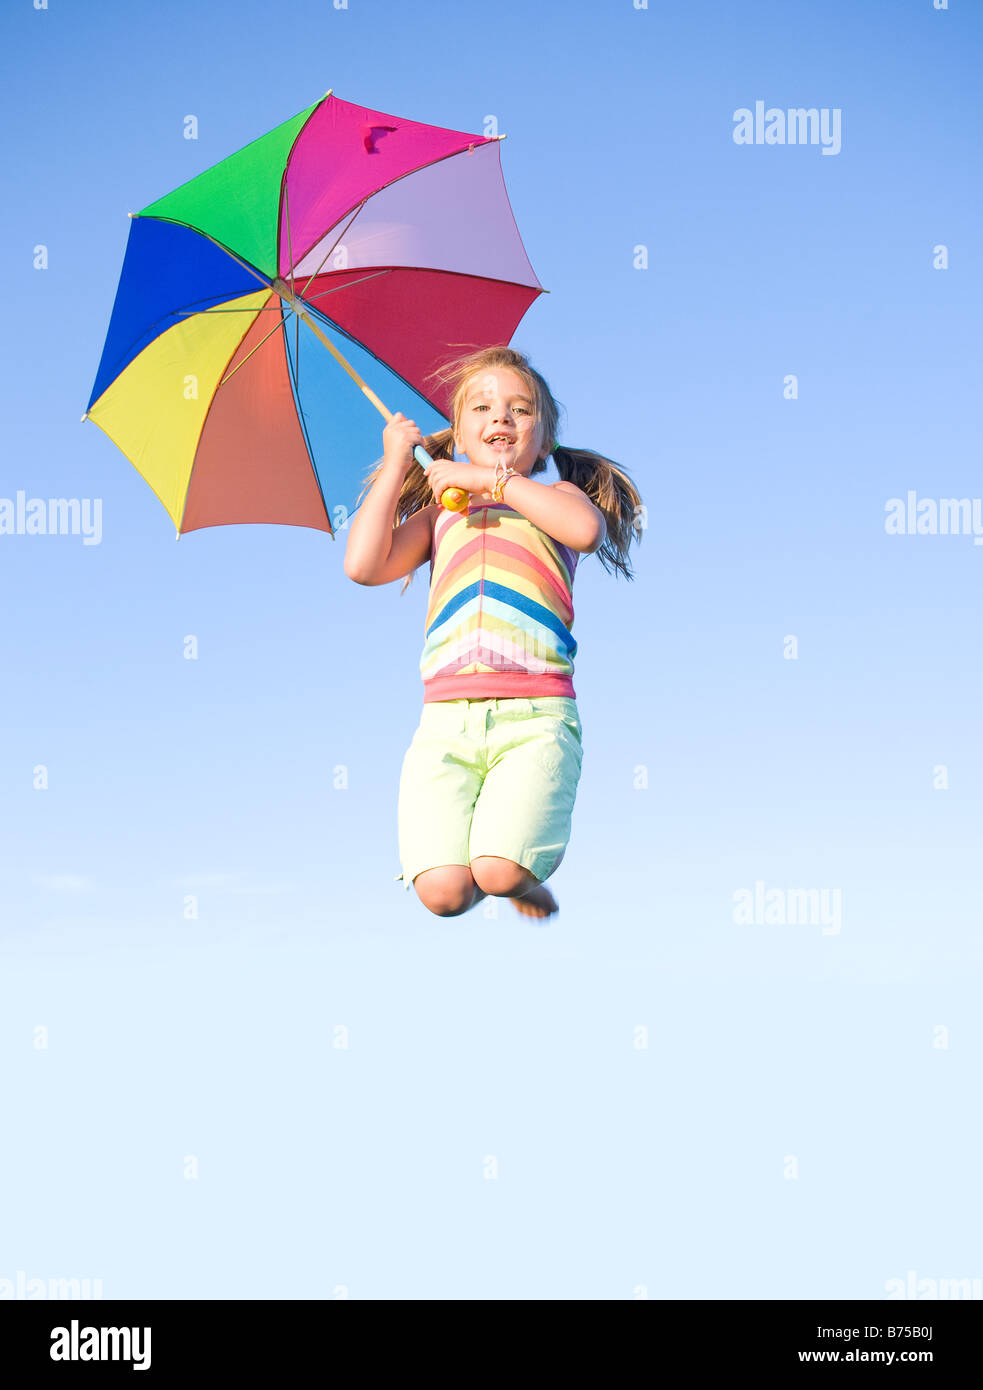 Six year old girl jumping with umbrella, Winnipeg, Manitoba, Canada - Stock Image